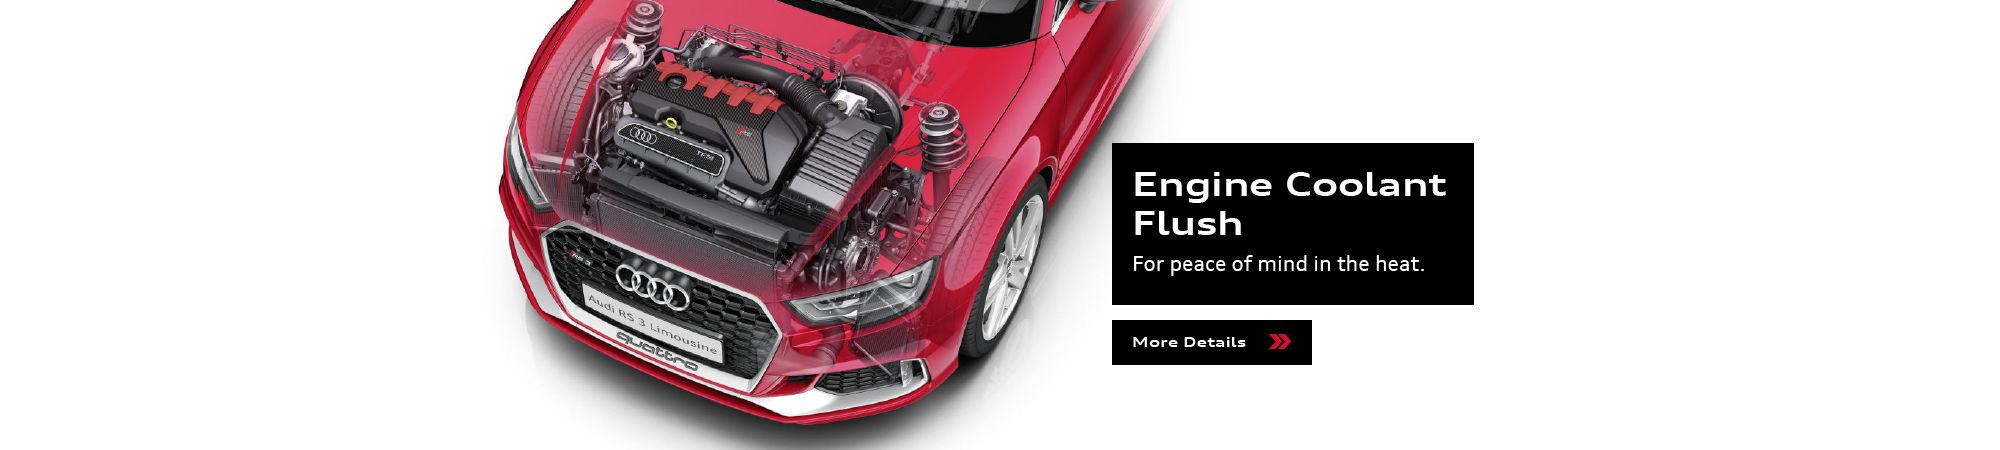 Engine Coolant Flush (Slider)